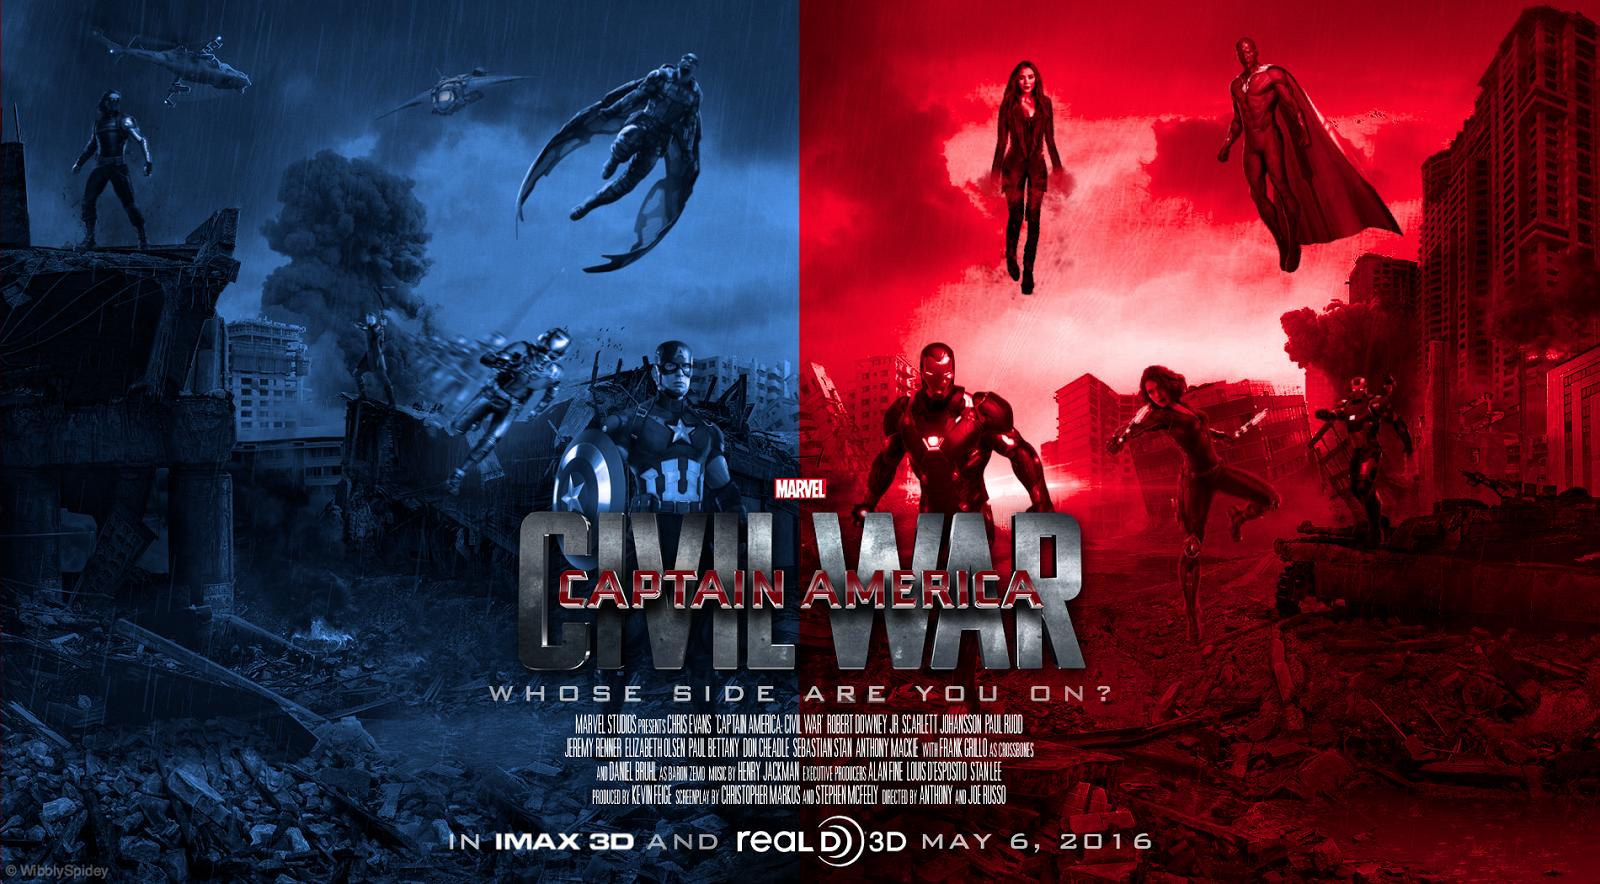 Captain America Civil War 2016 Amazing Wallpaper Collection In Hd